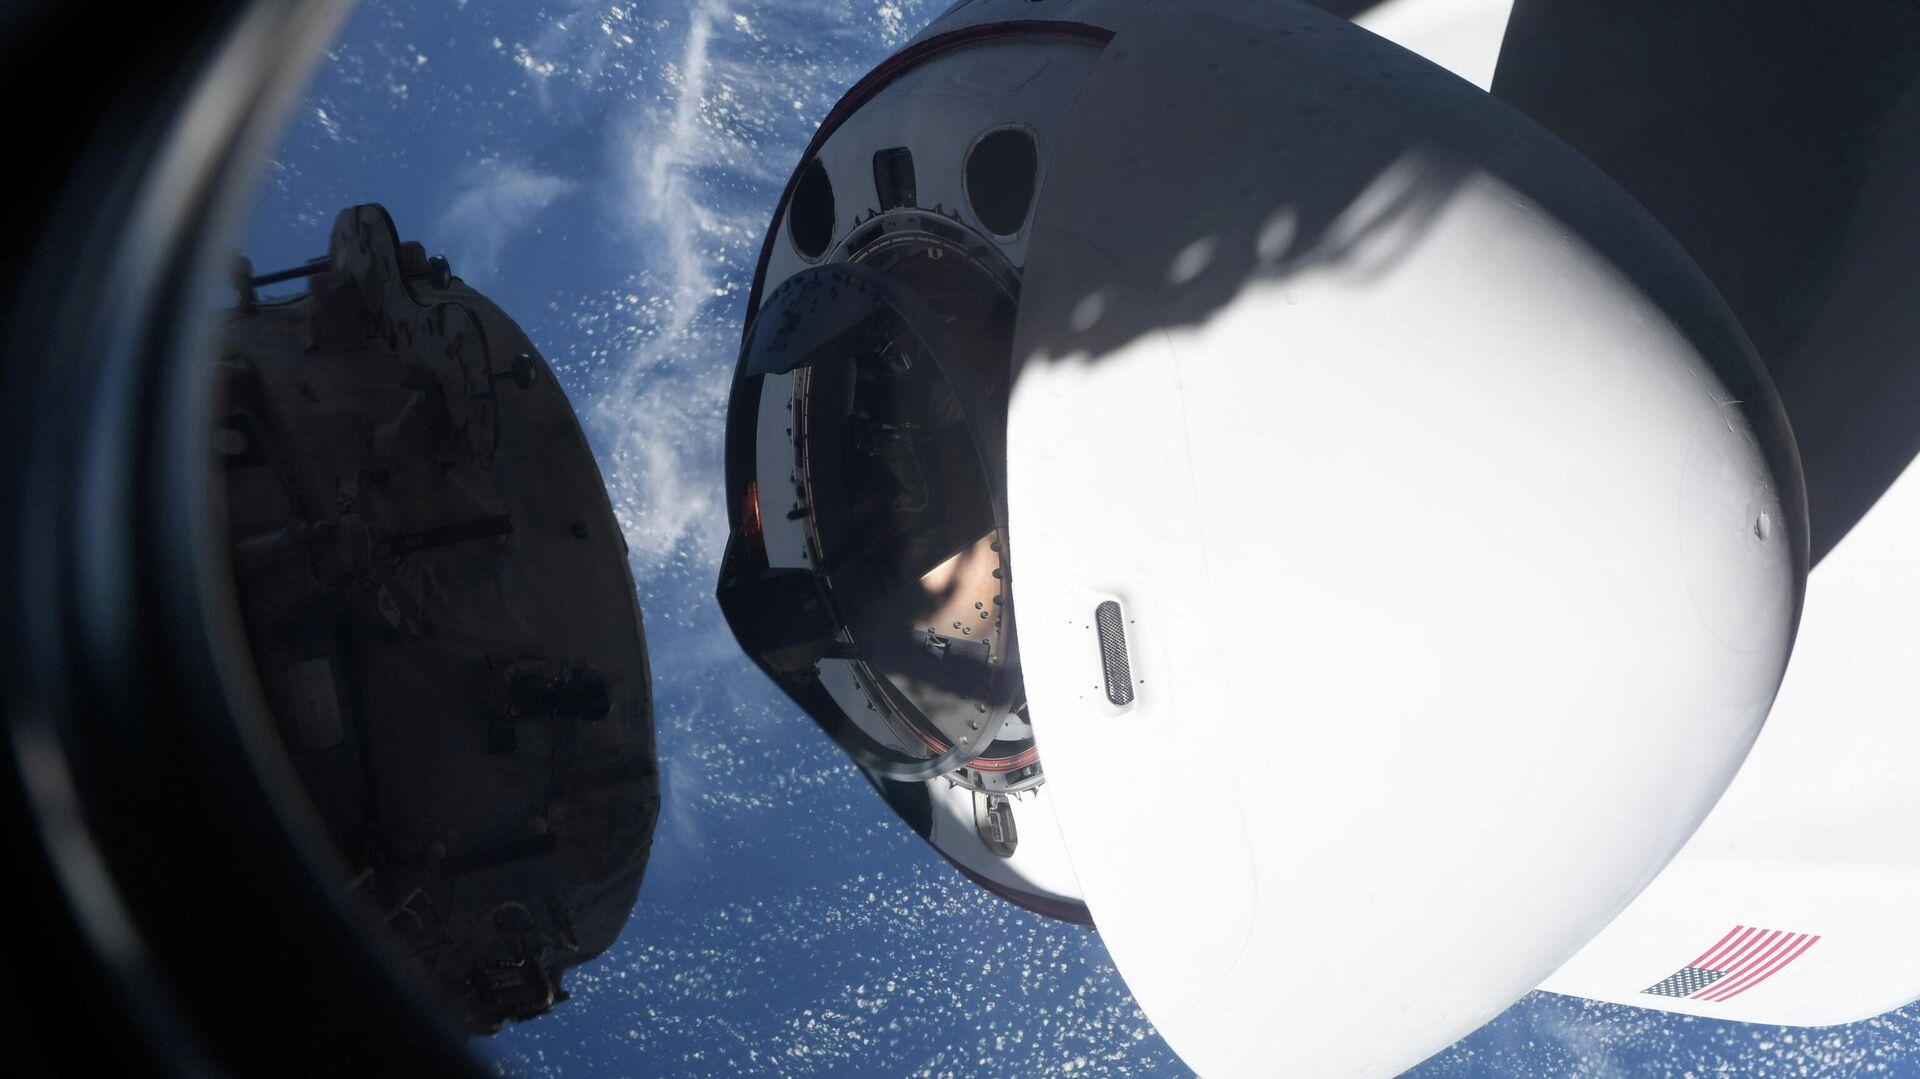 Cápsula de la nave espacial Crew Dragon - Sputnik Mundo, 1920, 02.05.2021